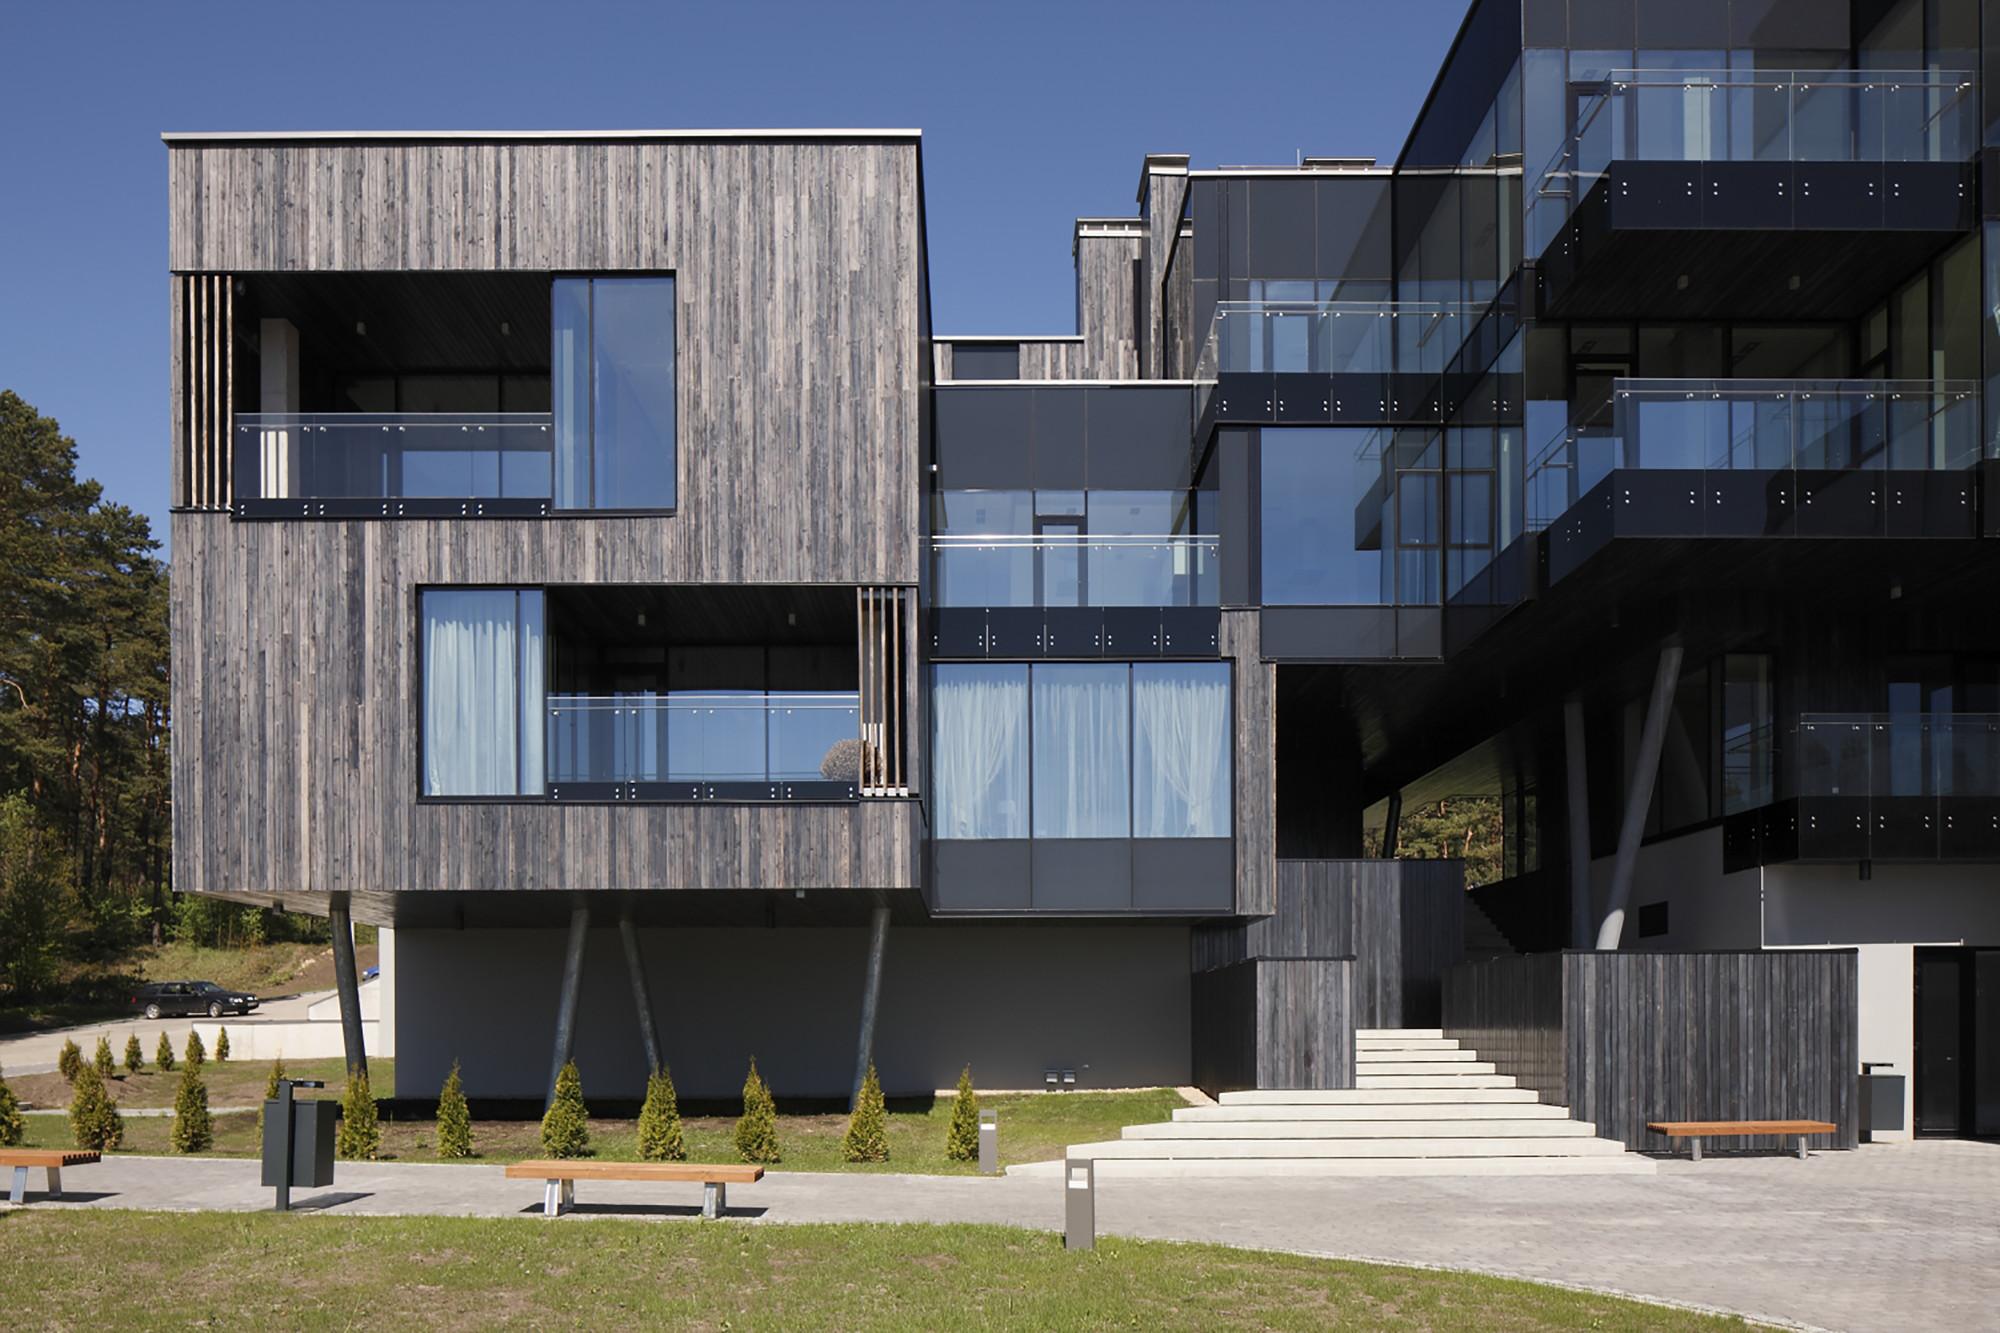 Residential complex Ciekurkrasti / AB3D  , © Ansis Starks